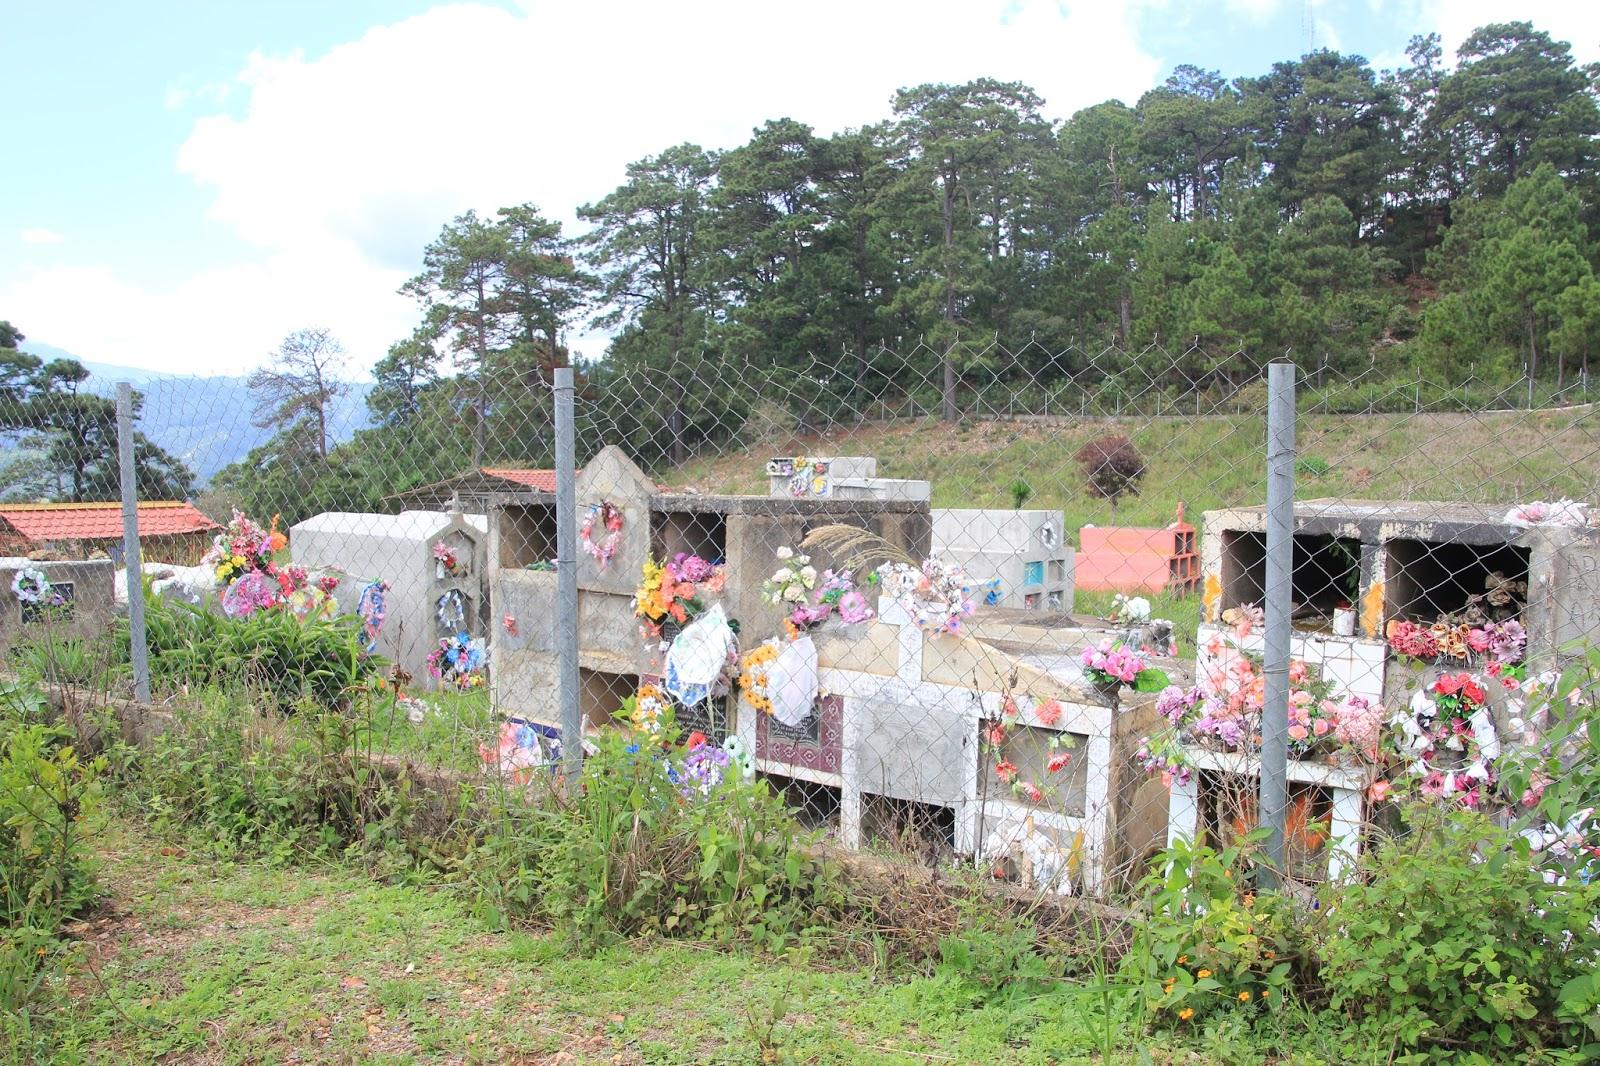 Photo caption: Community cemetery